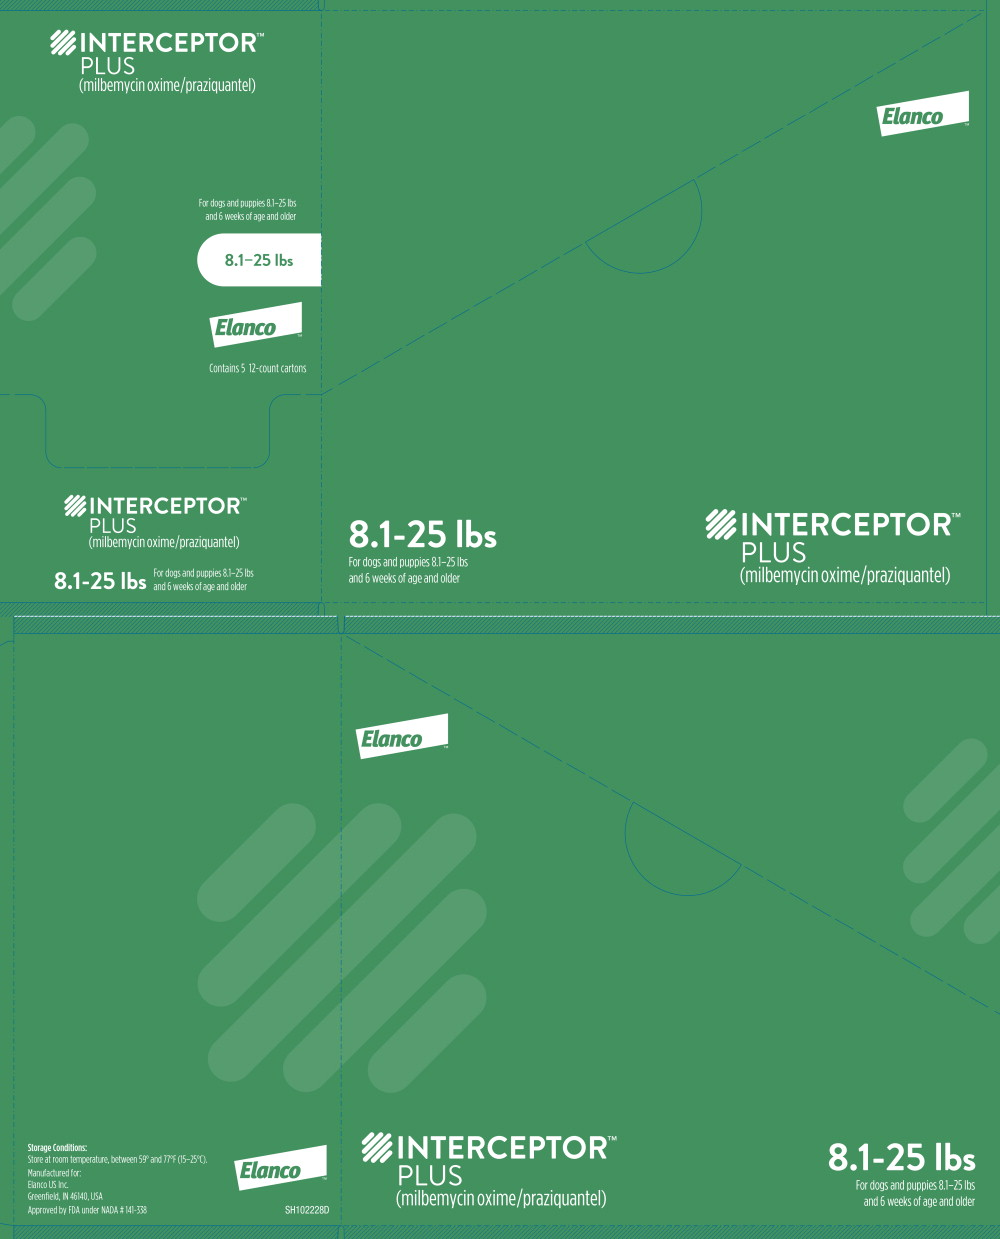 Principal Display Panel - Interceptor Plus 8.1-25 lbs 12 Carton Box Label